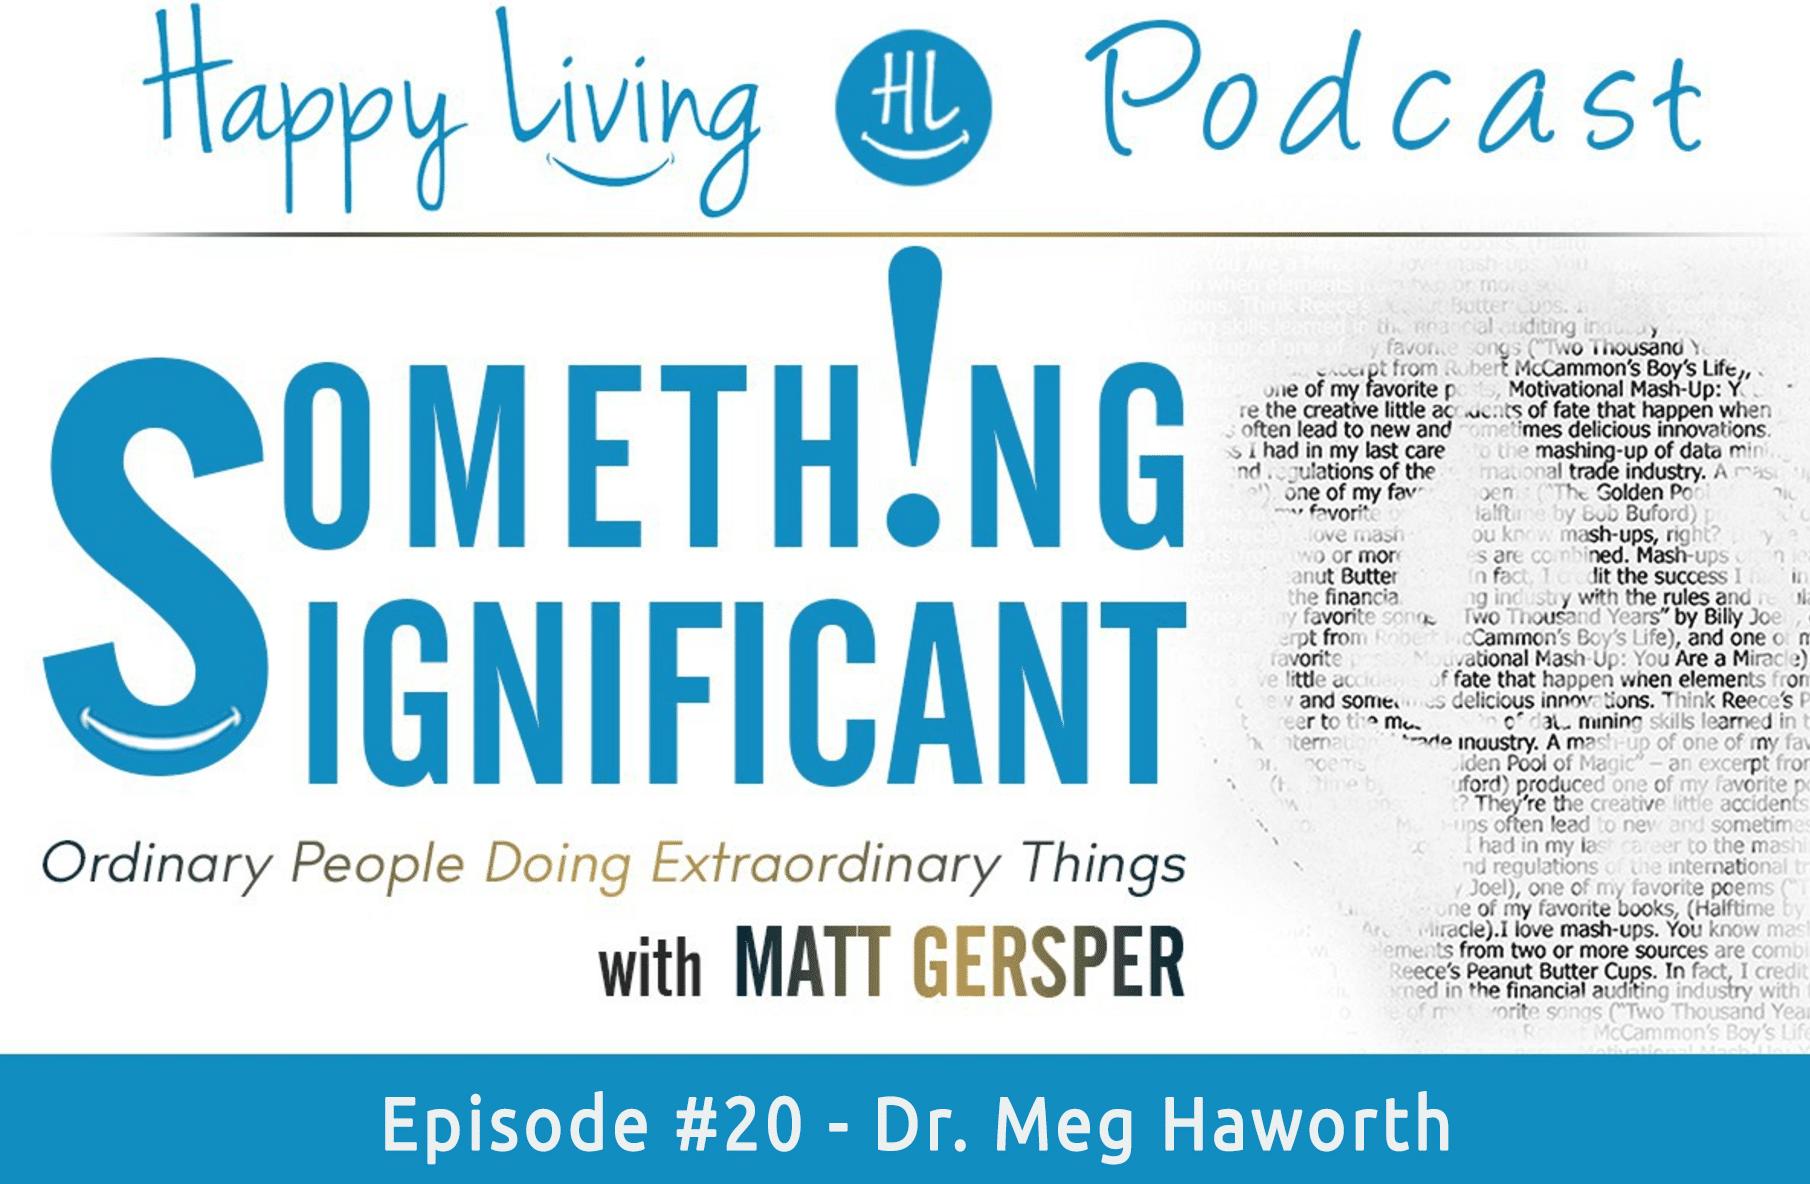 #20 – Dr. Meg Haworth